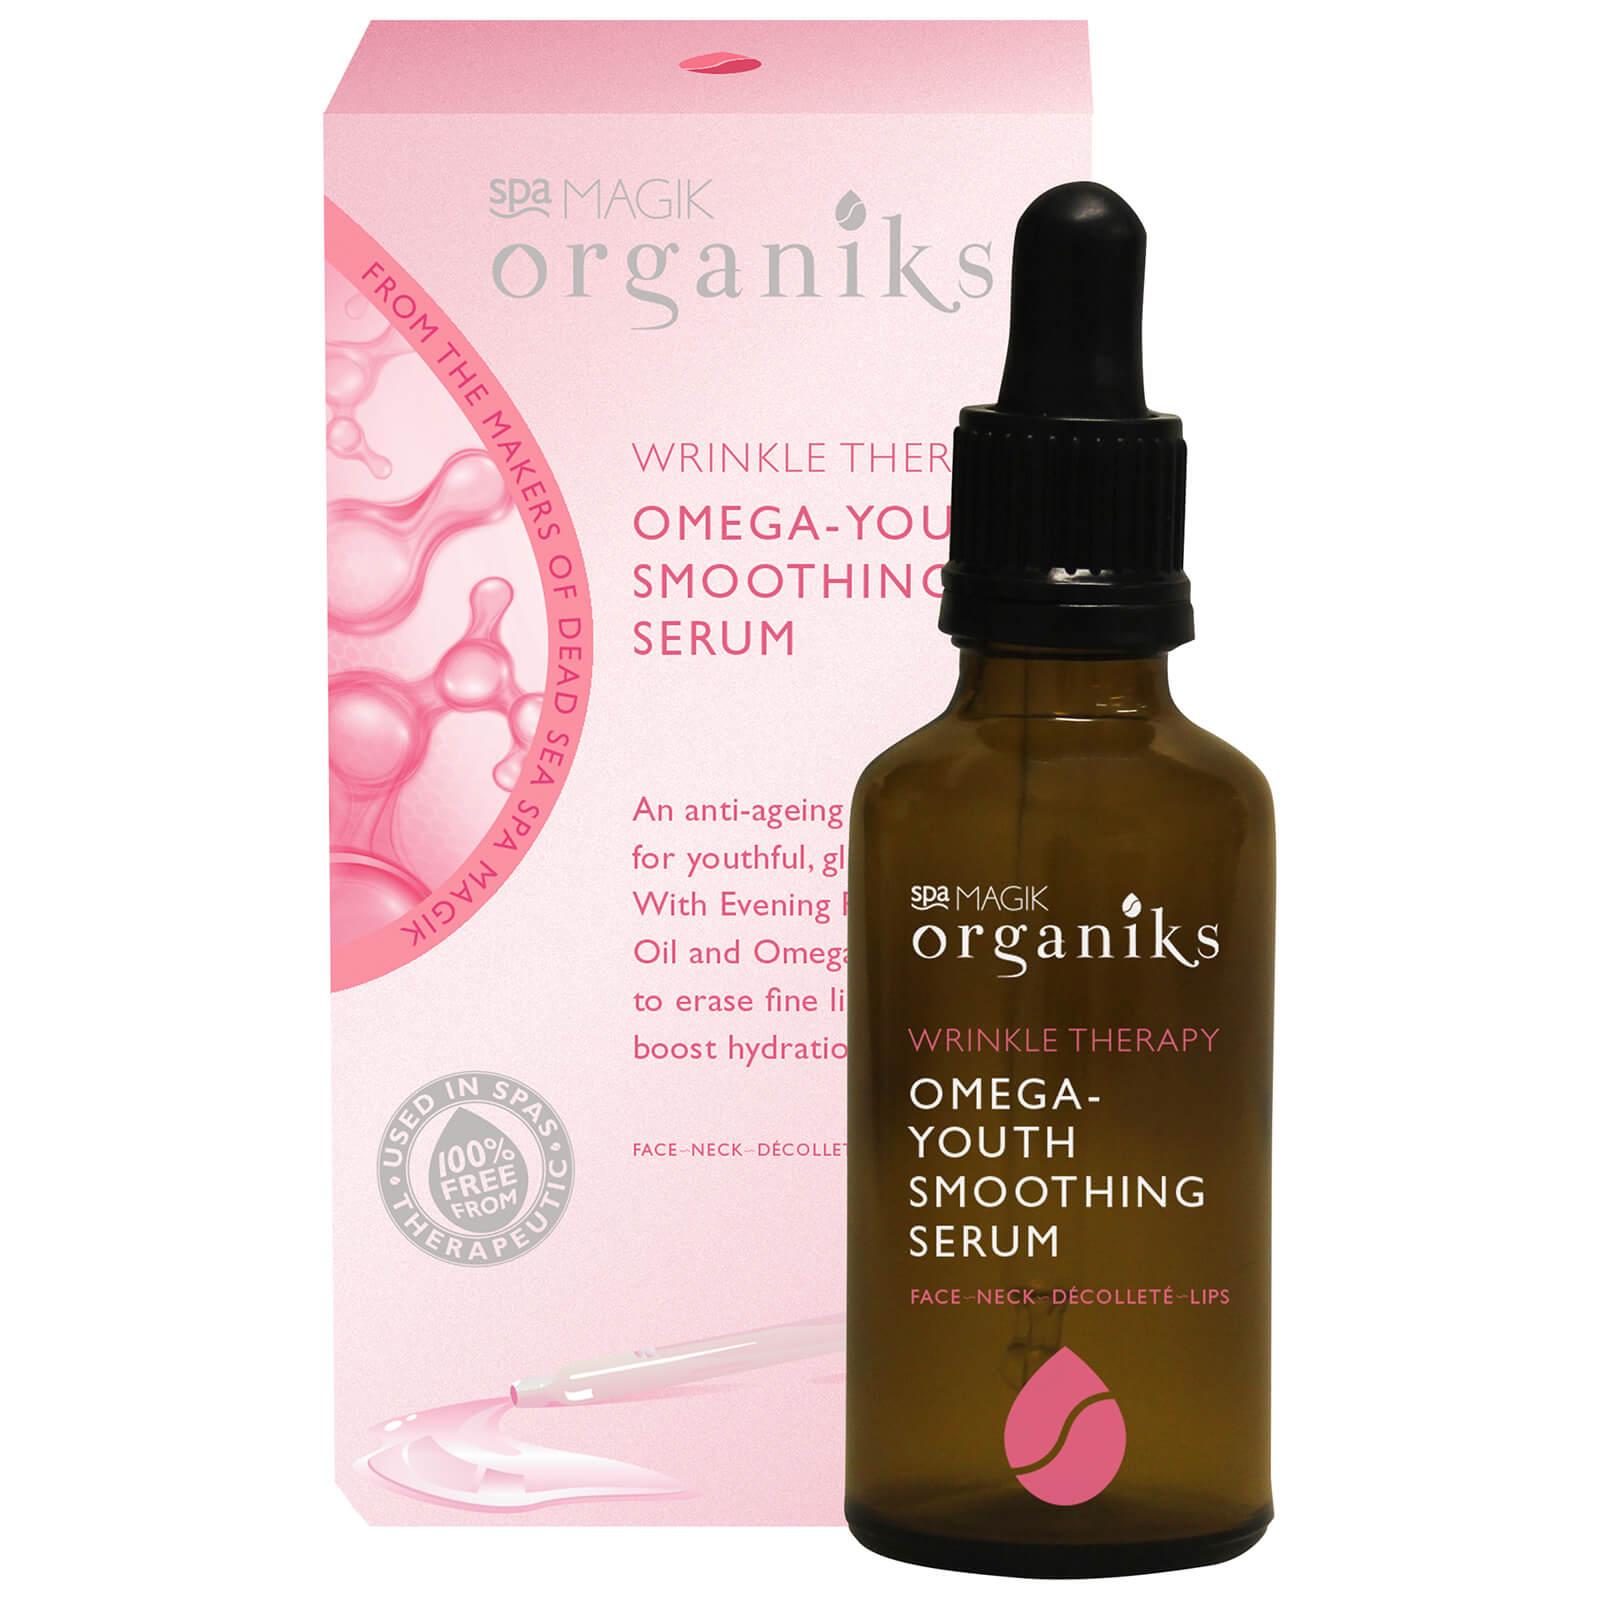 Купить Антивозрастная сыворотка с жирными кислотами омега-3 Spa Magik Organiks Wrinkle Therapy Omega-Youth Smoothing Serum